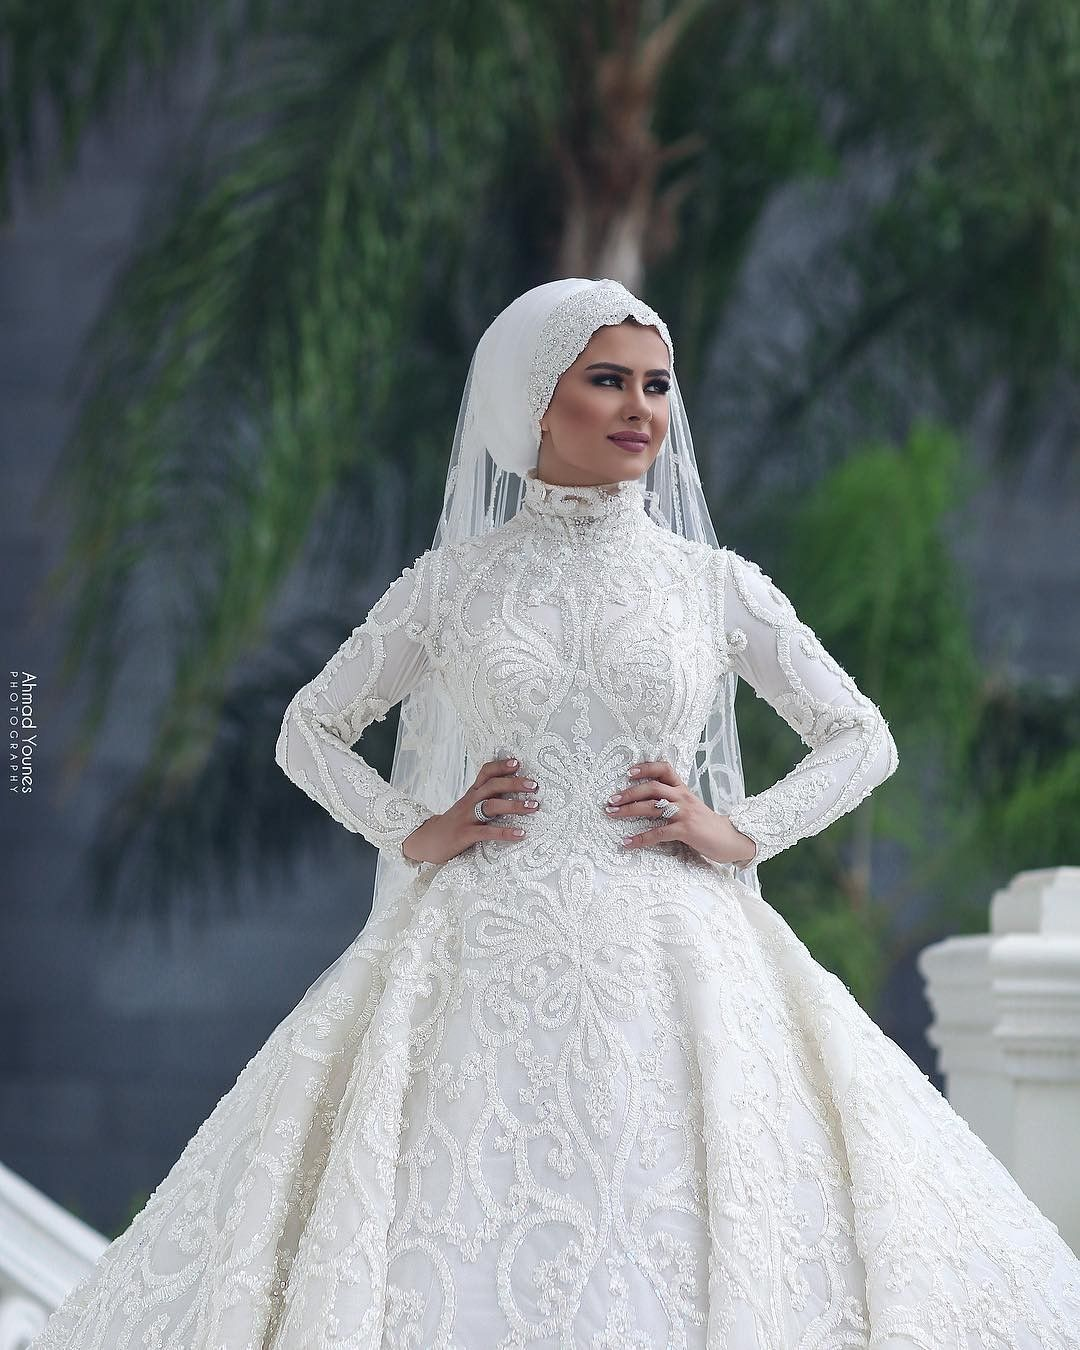 Pin By Ammaarah Behardien On Bridal Hijab حجاب الزفاف Muslim Wedding Dresses Wedding Dresses Wedding Dresses Simple [ 1350 x 1080 Pixel ]